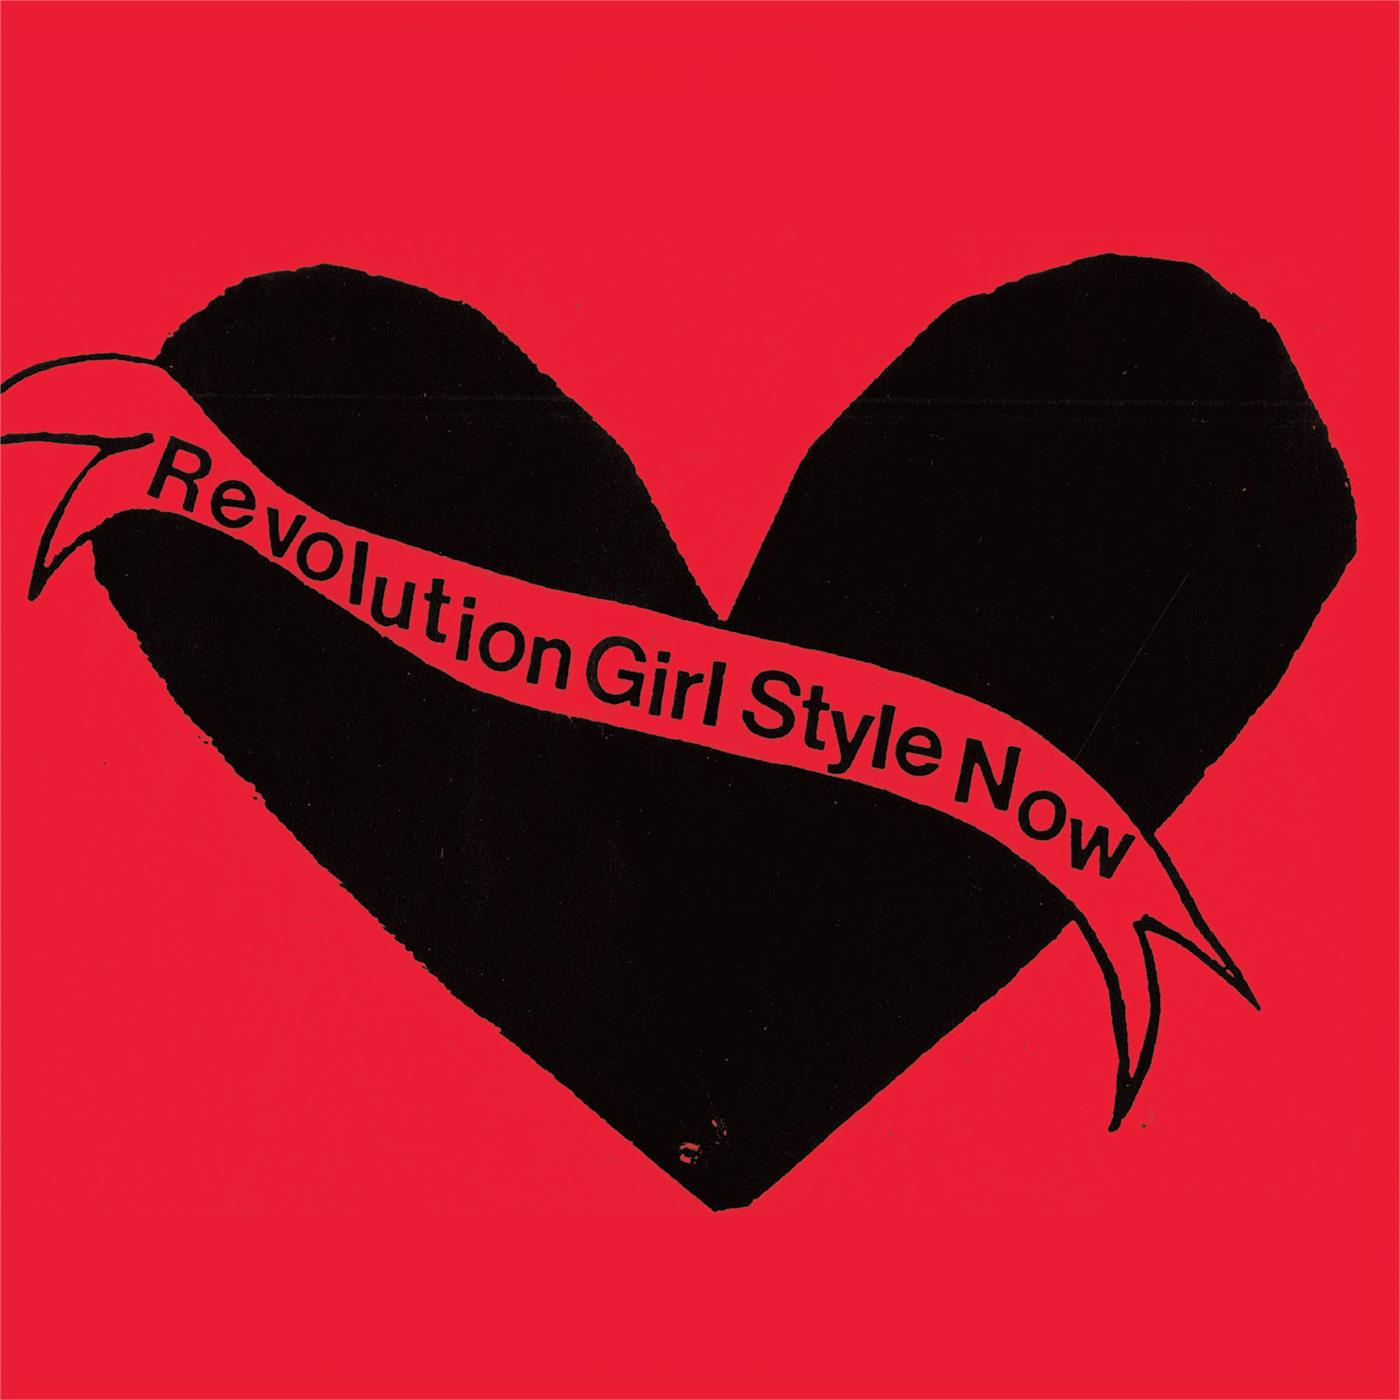 Bikini Kill - Revolution Girl Style Now [LP]